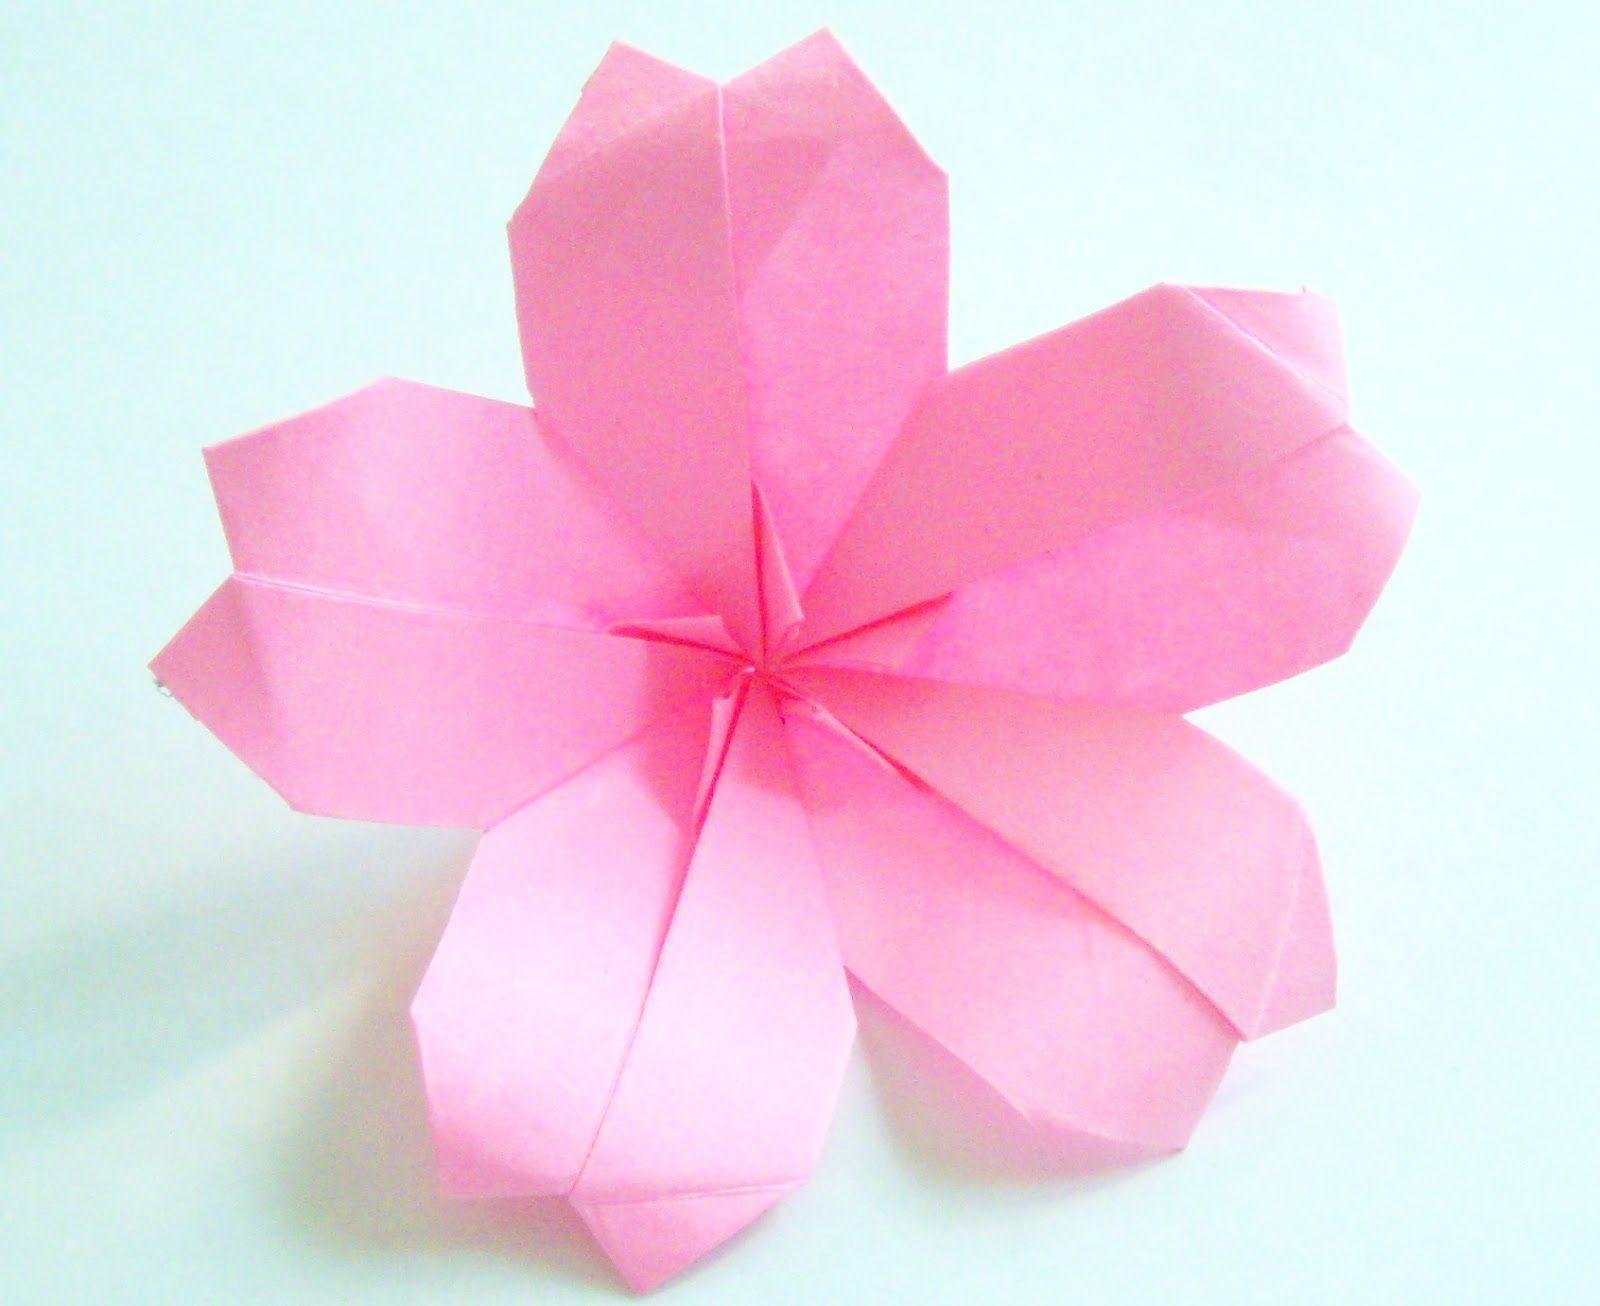 ORIGAMI | Origami: Origami Cherry Blossom | Paper craft ... - photo#40